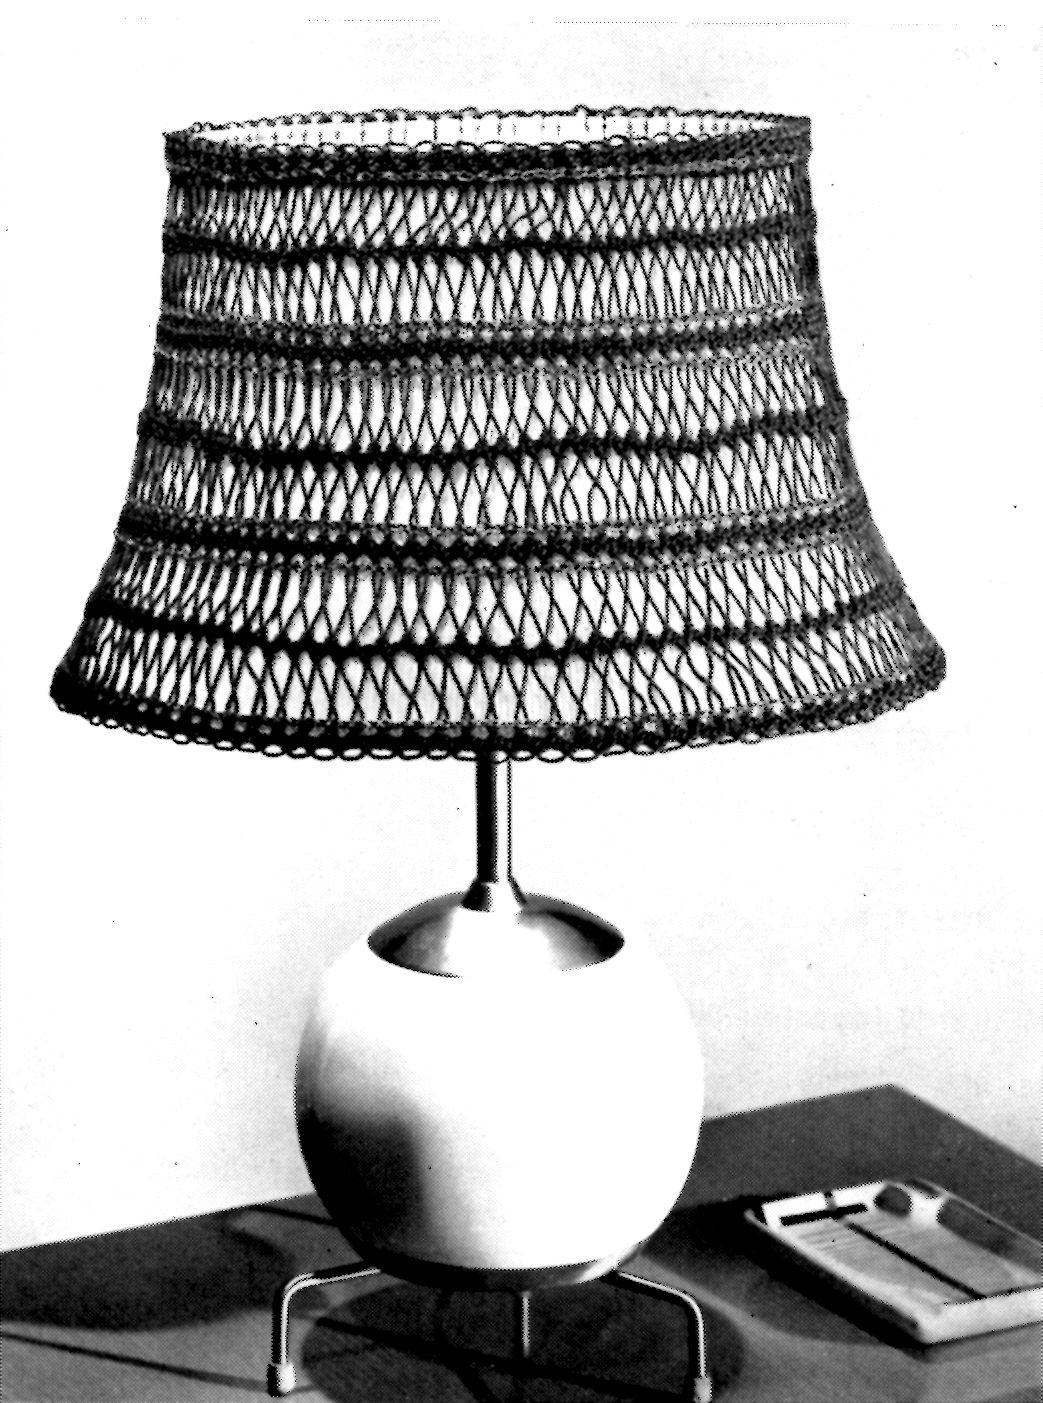 Crocheted lamp shade patterns archives vintage crafts and more vintage crafts and more hairpin lace lamp shade pattern aloadofball Choice Image